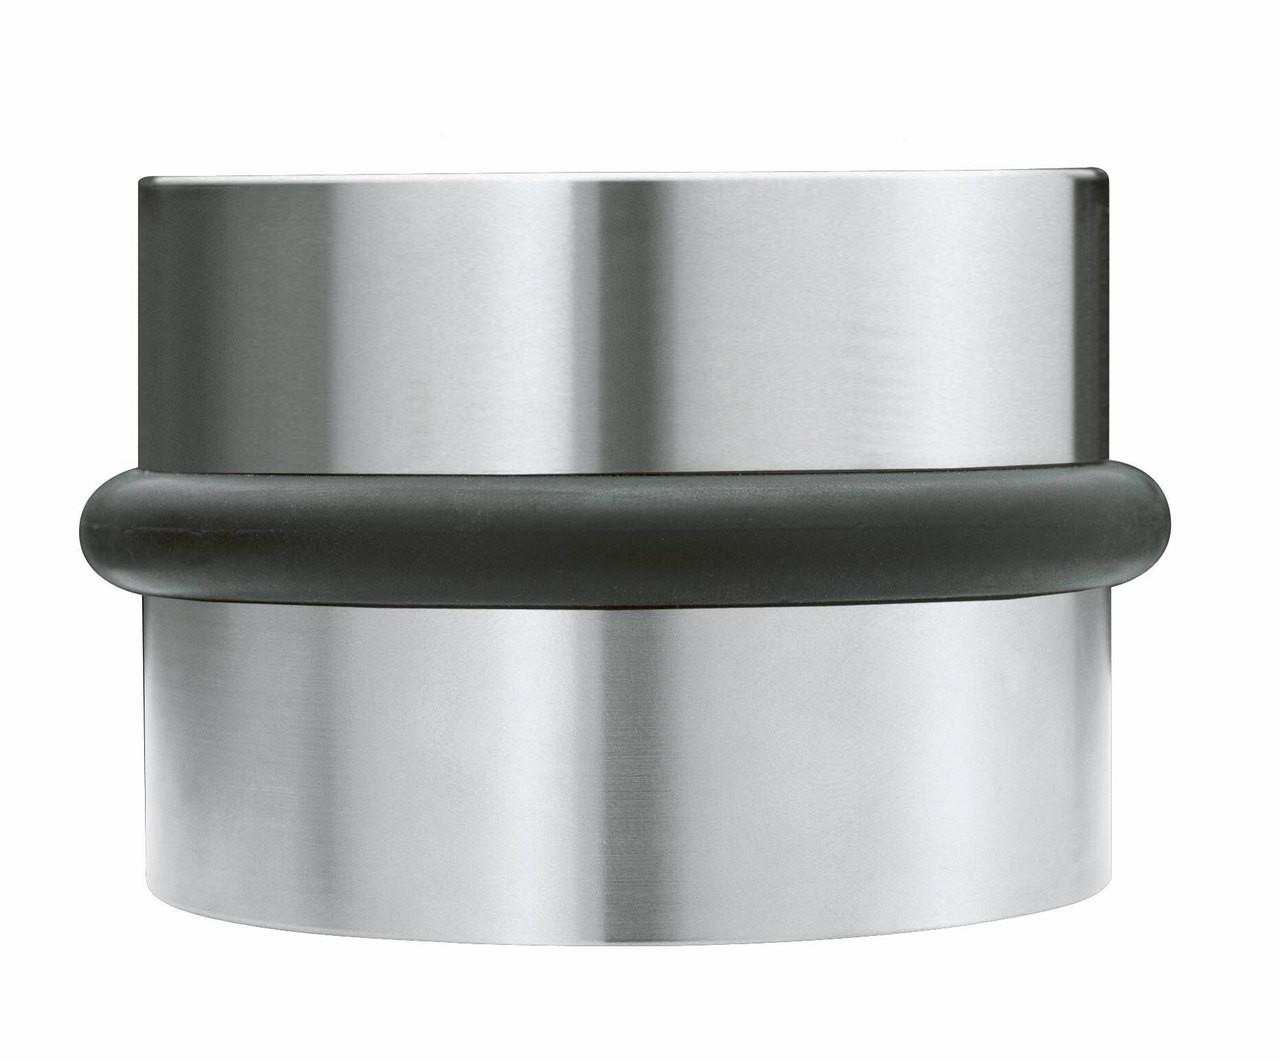 Modern Door Hardware | Stainless Steel | StainlessDoorHardware